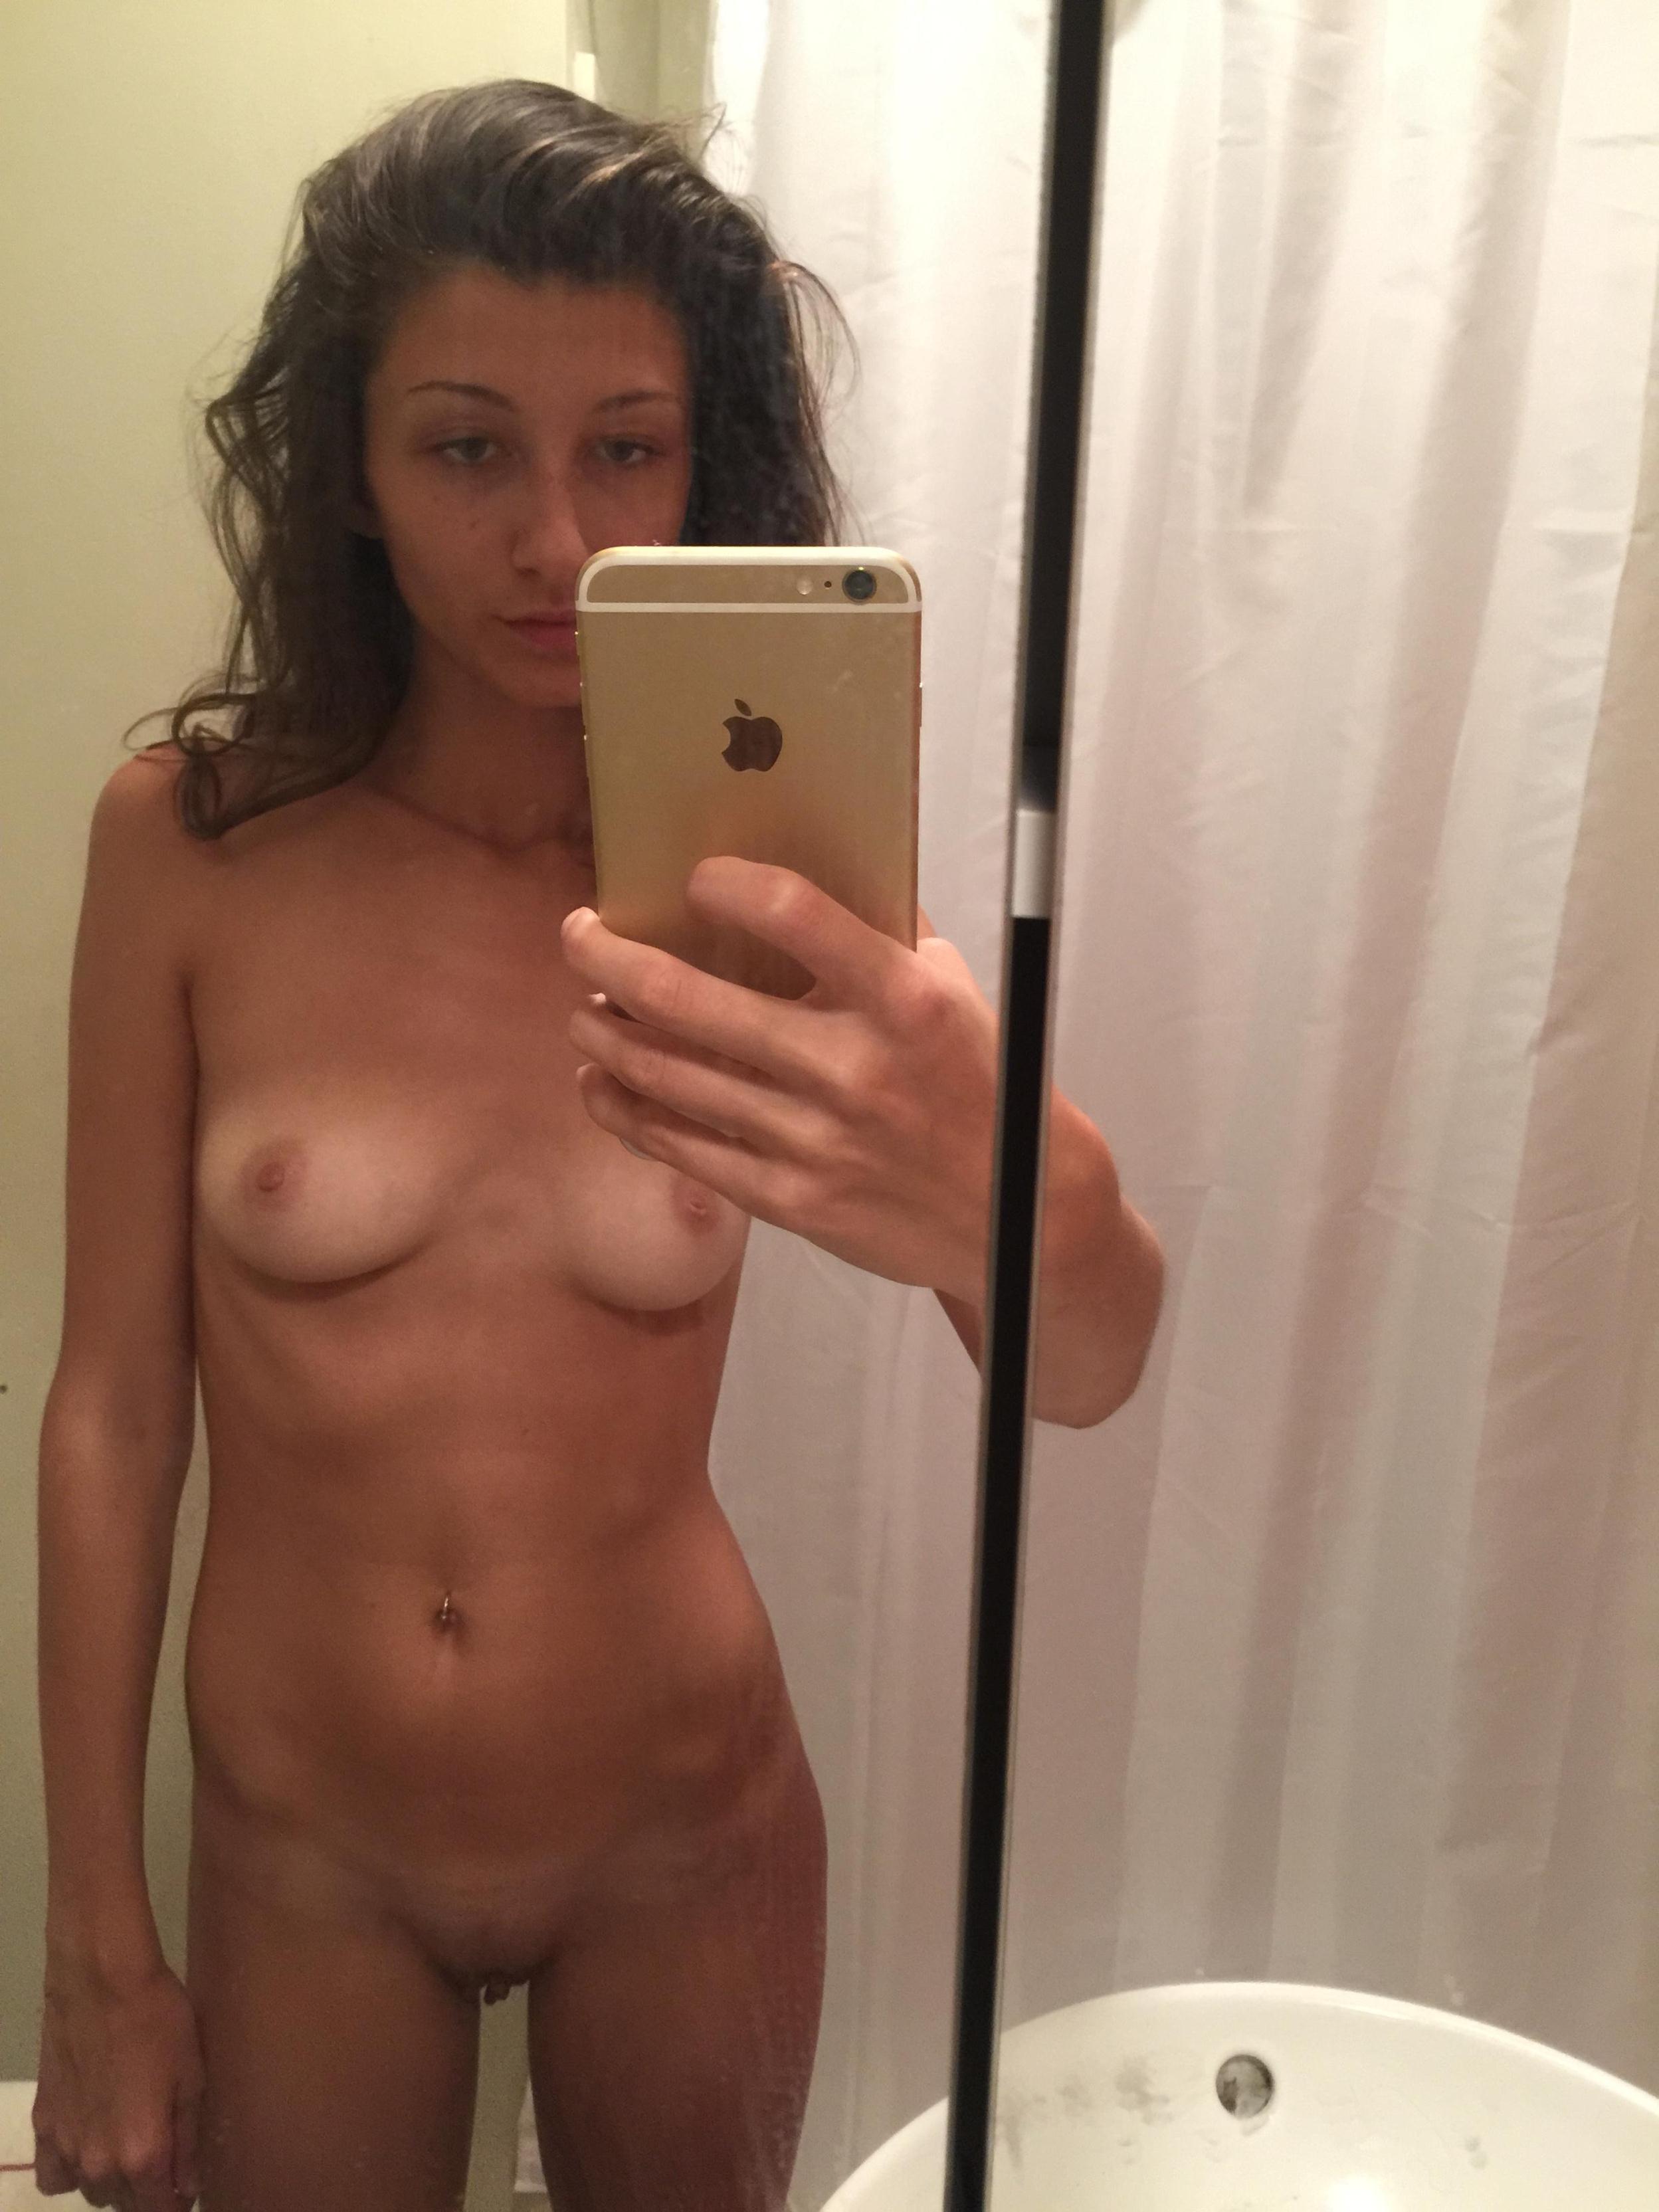 slim-body-amateur-girl-selfie-pics-mirror-nude-15